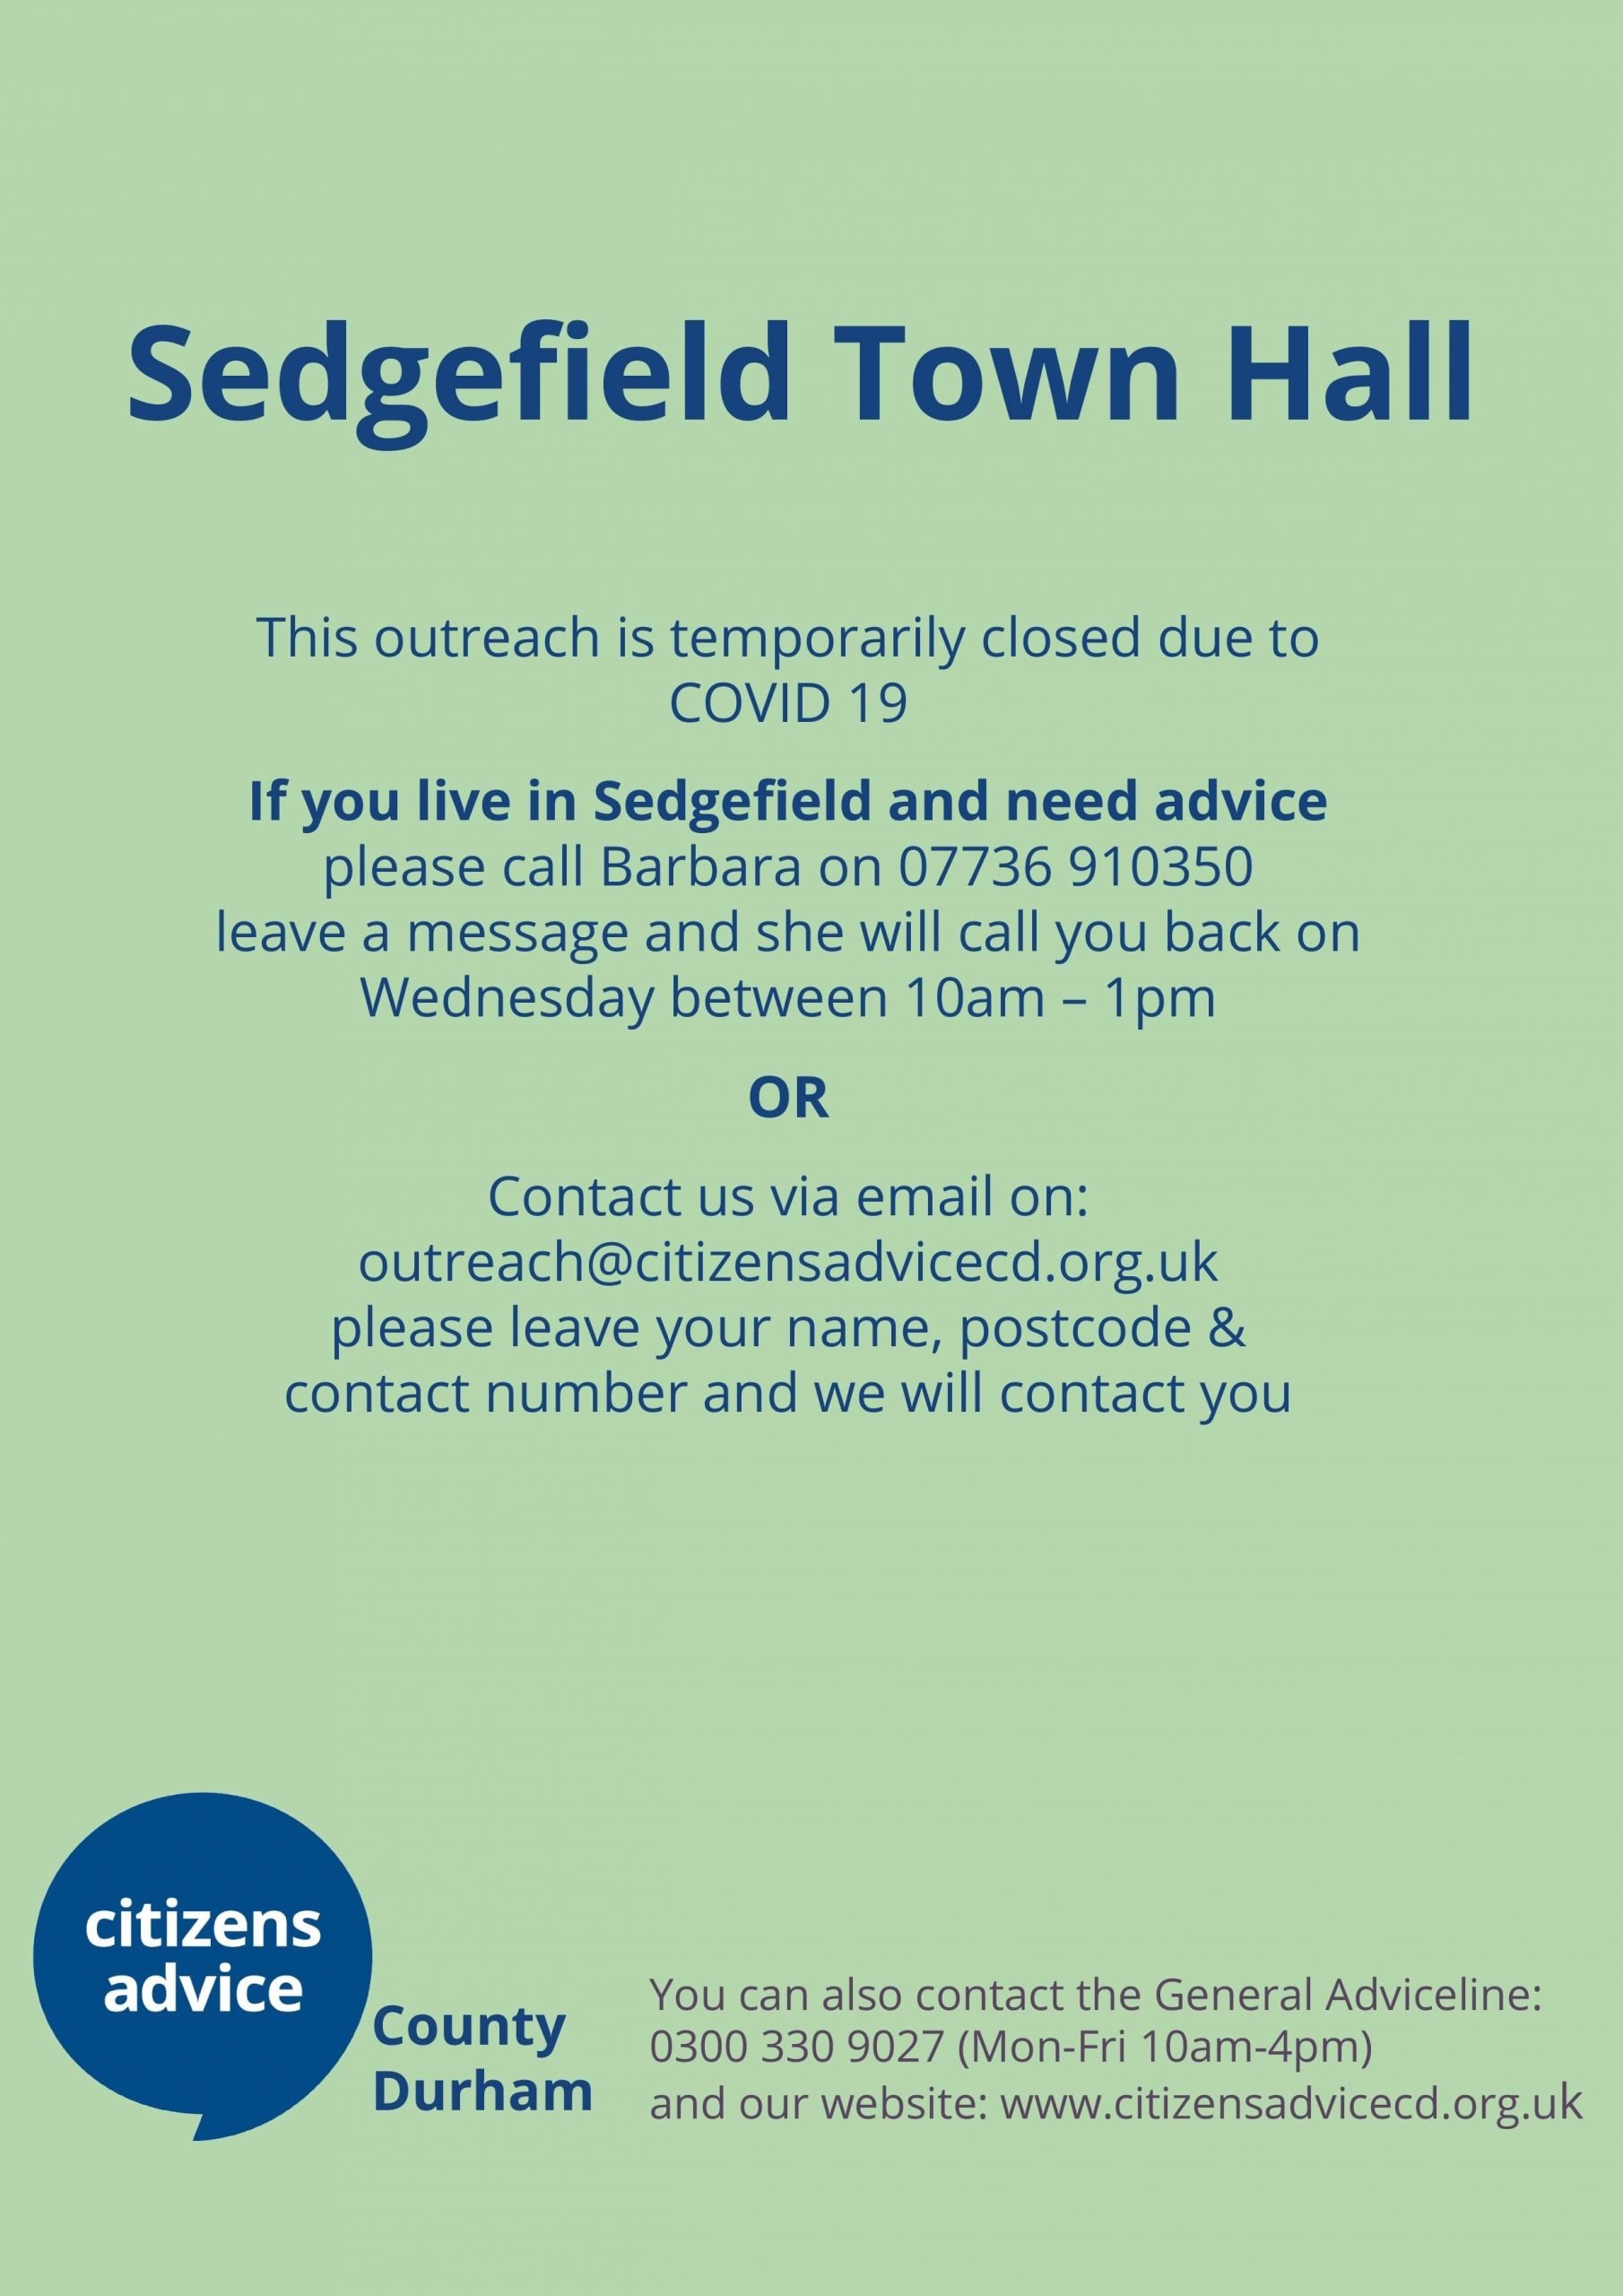 Sedgefield Outreach- Outreach closed but please call